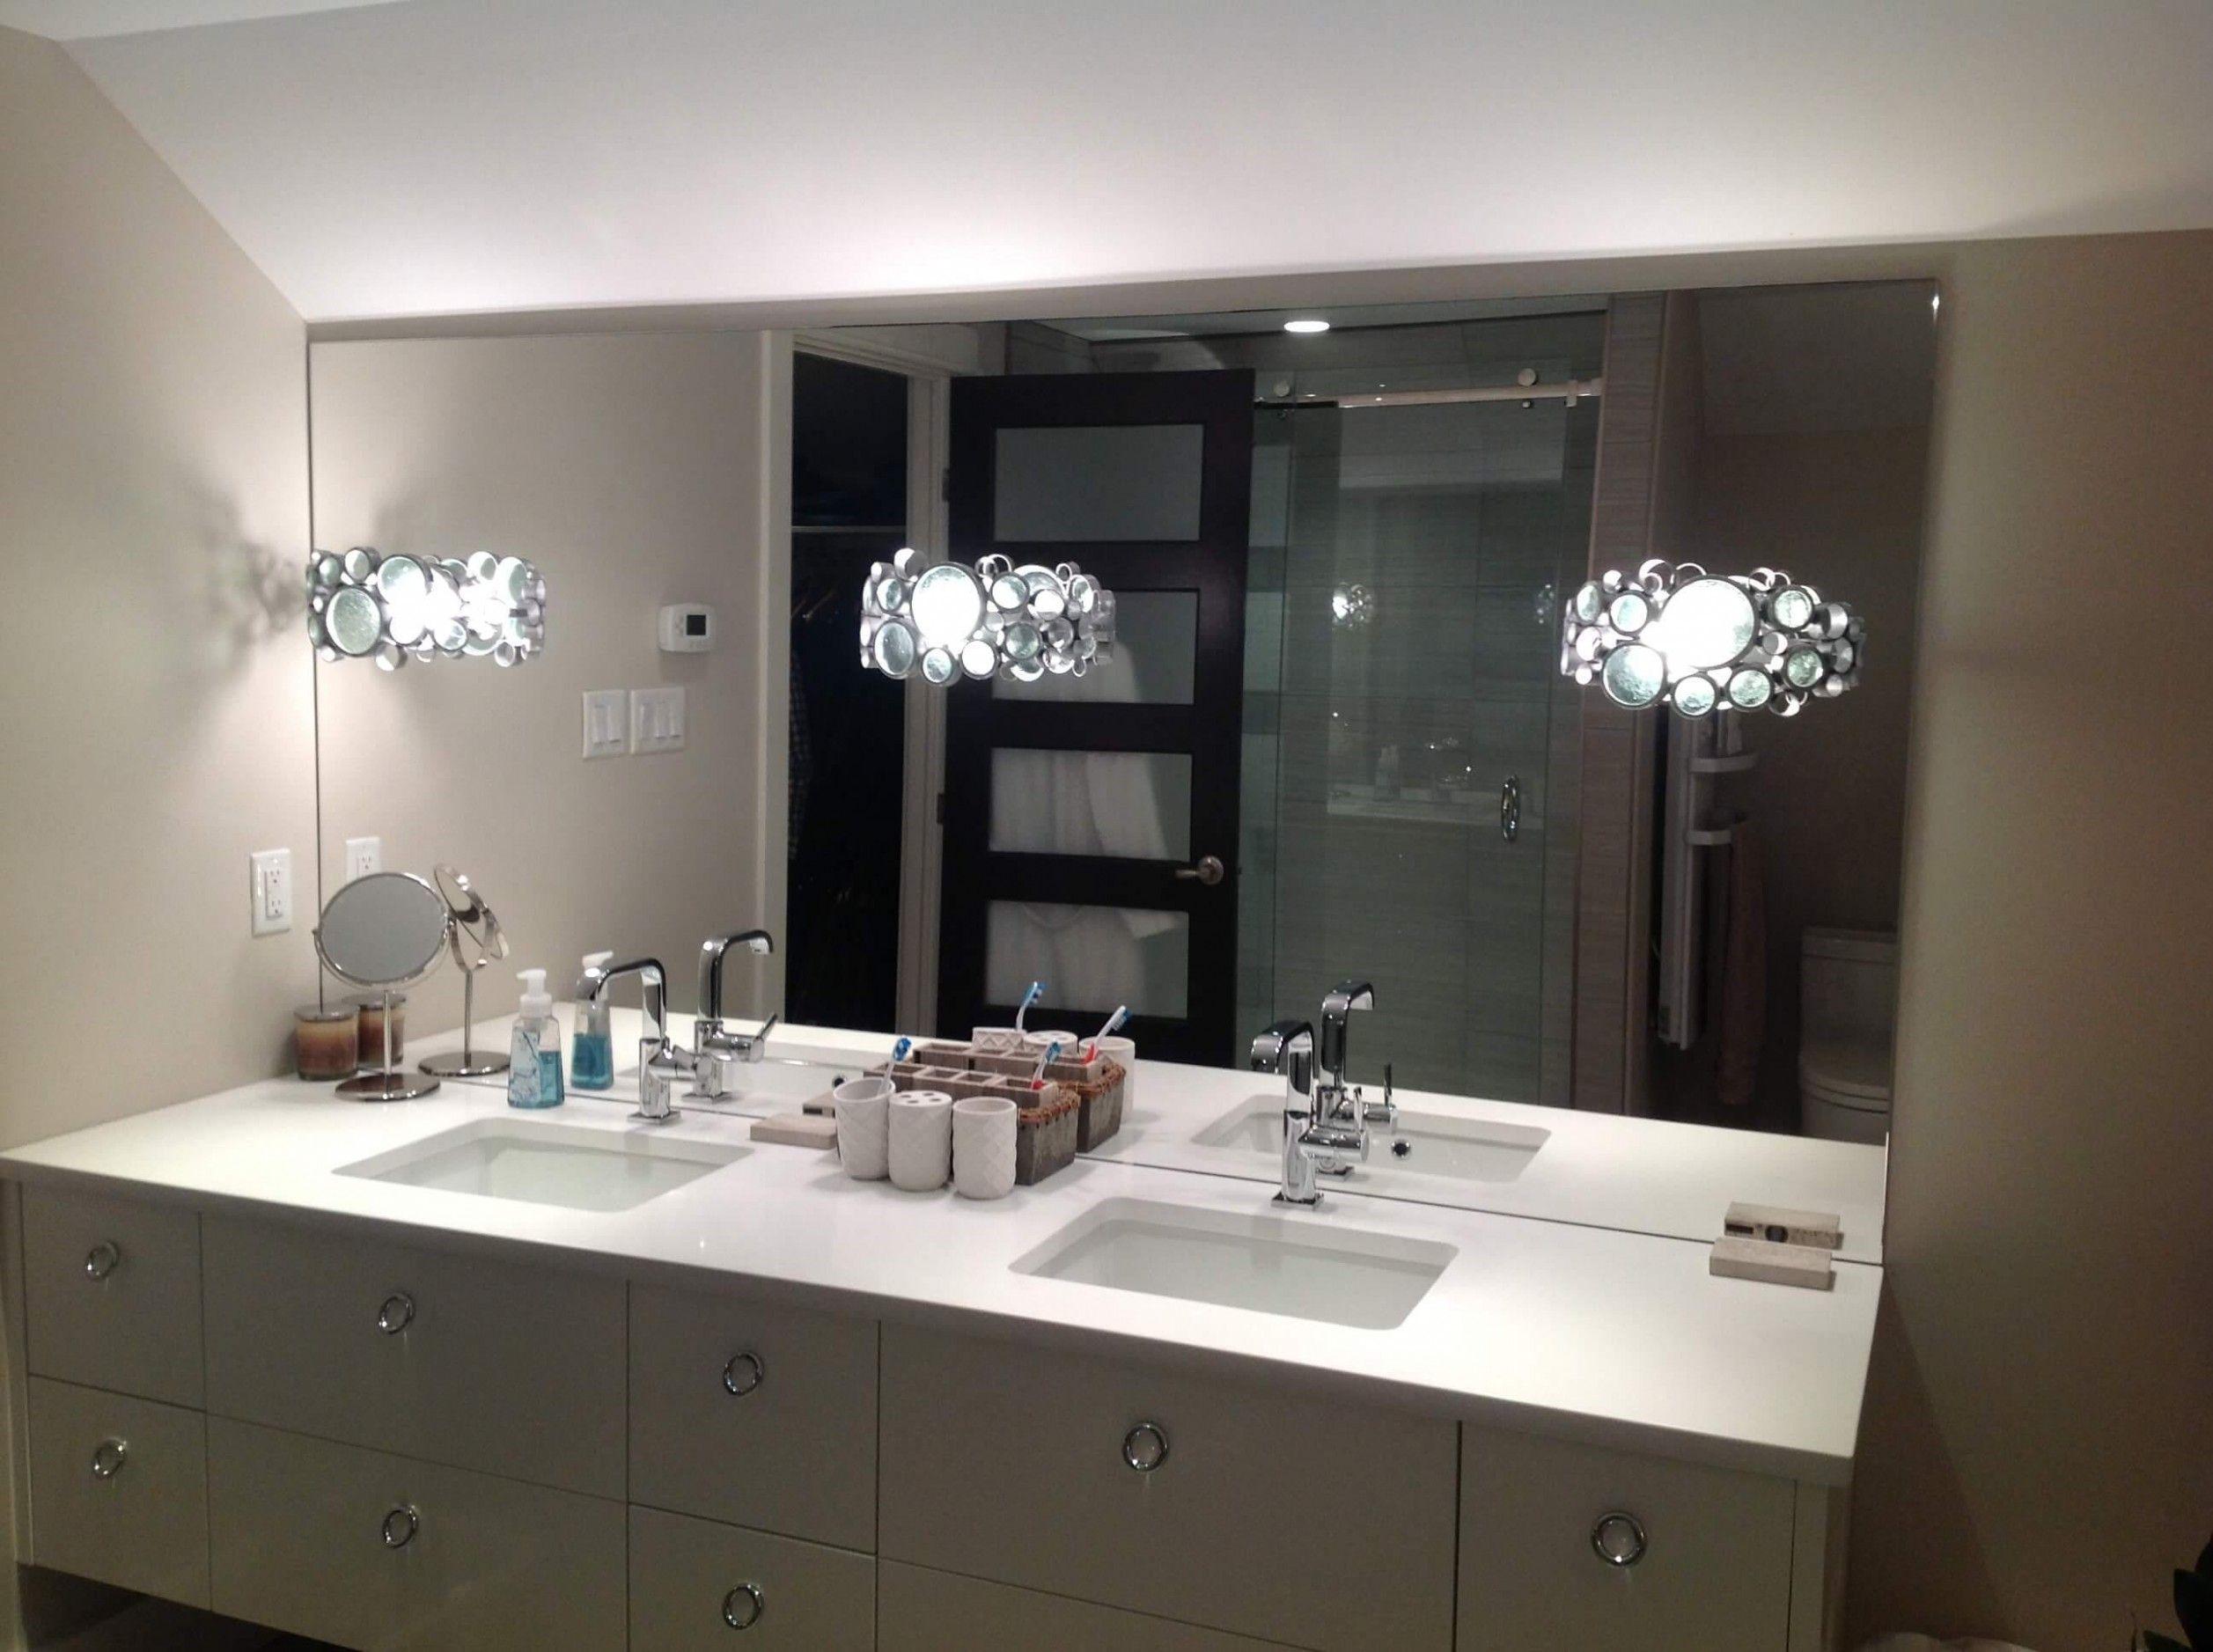 Ikea Bathroom Vanity Mirror A acceptable mirror can accomplish